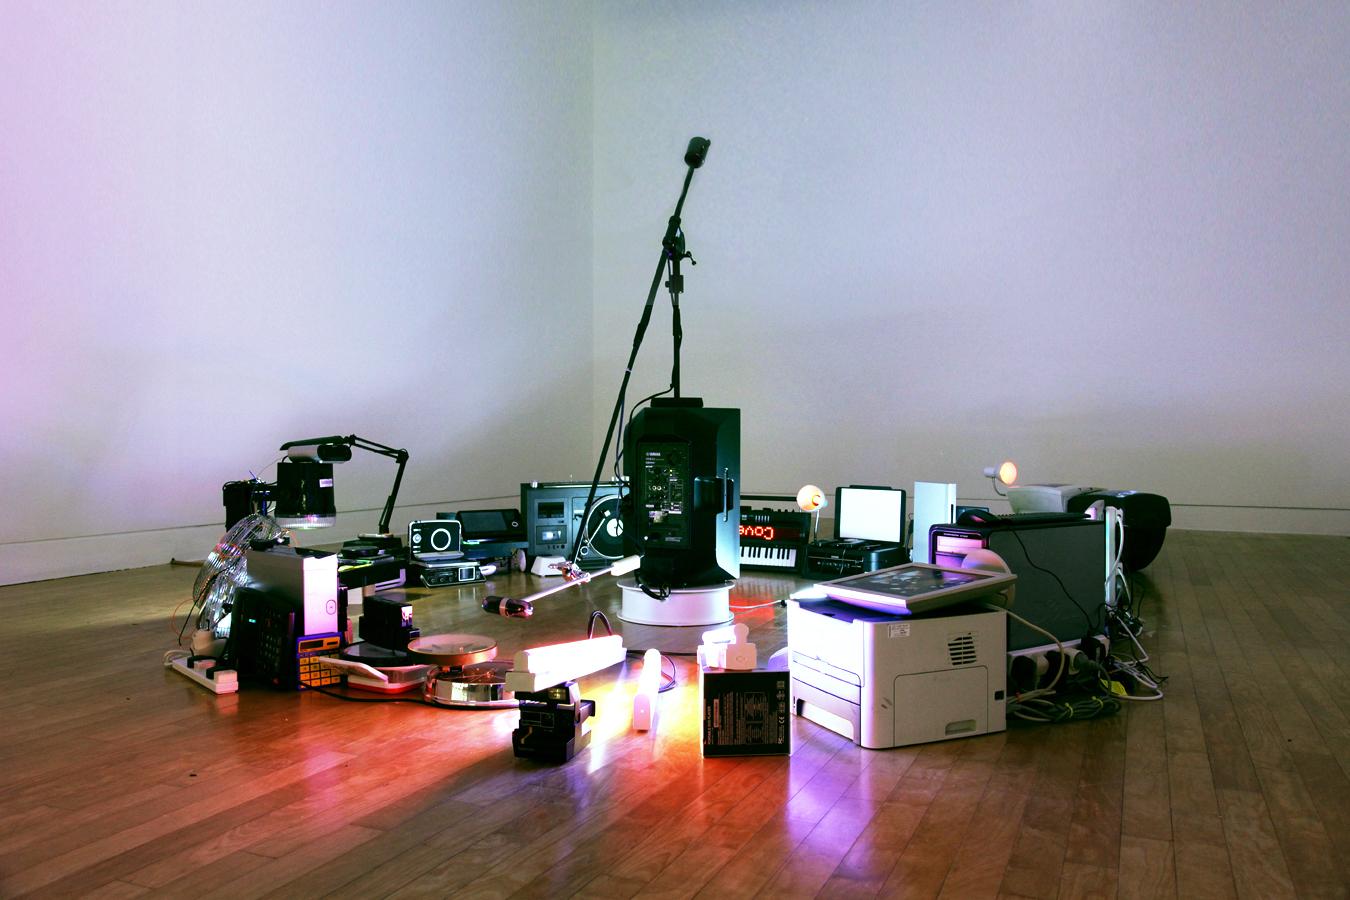 Electroprobe Installation #5, 2014 | Troika (Conny Freyer, Eva Rucki, Sebastien Noel)